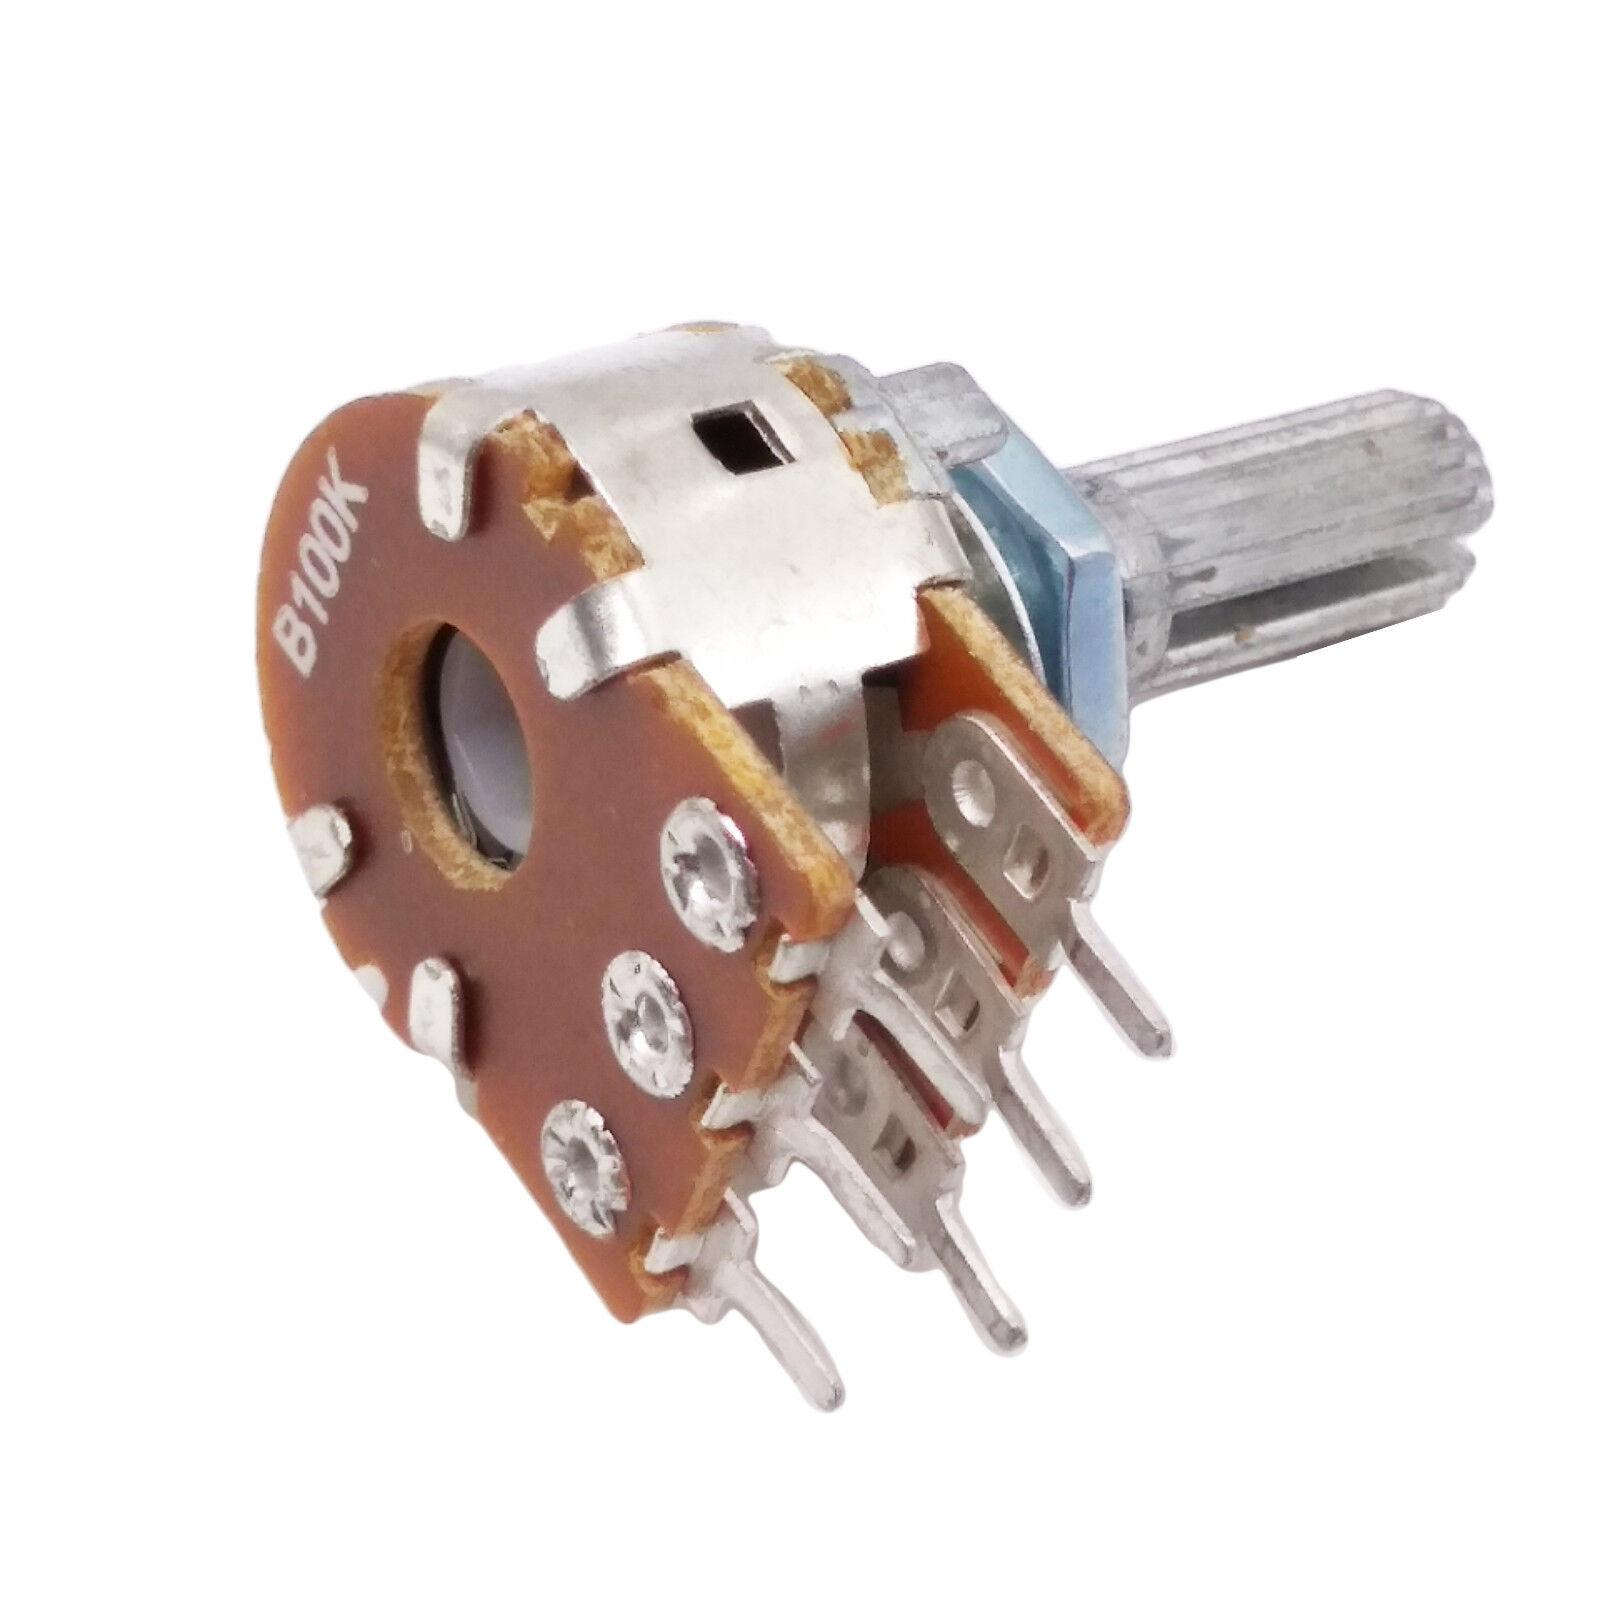 5Pcs TSL257-LF Sensor Light Voltage Converter um